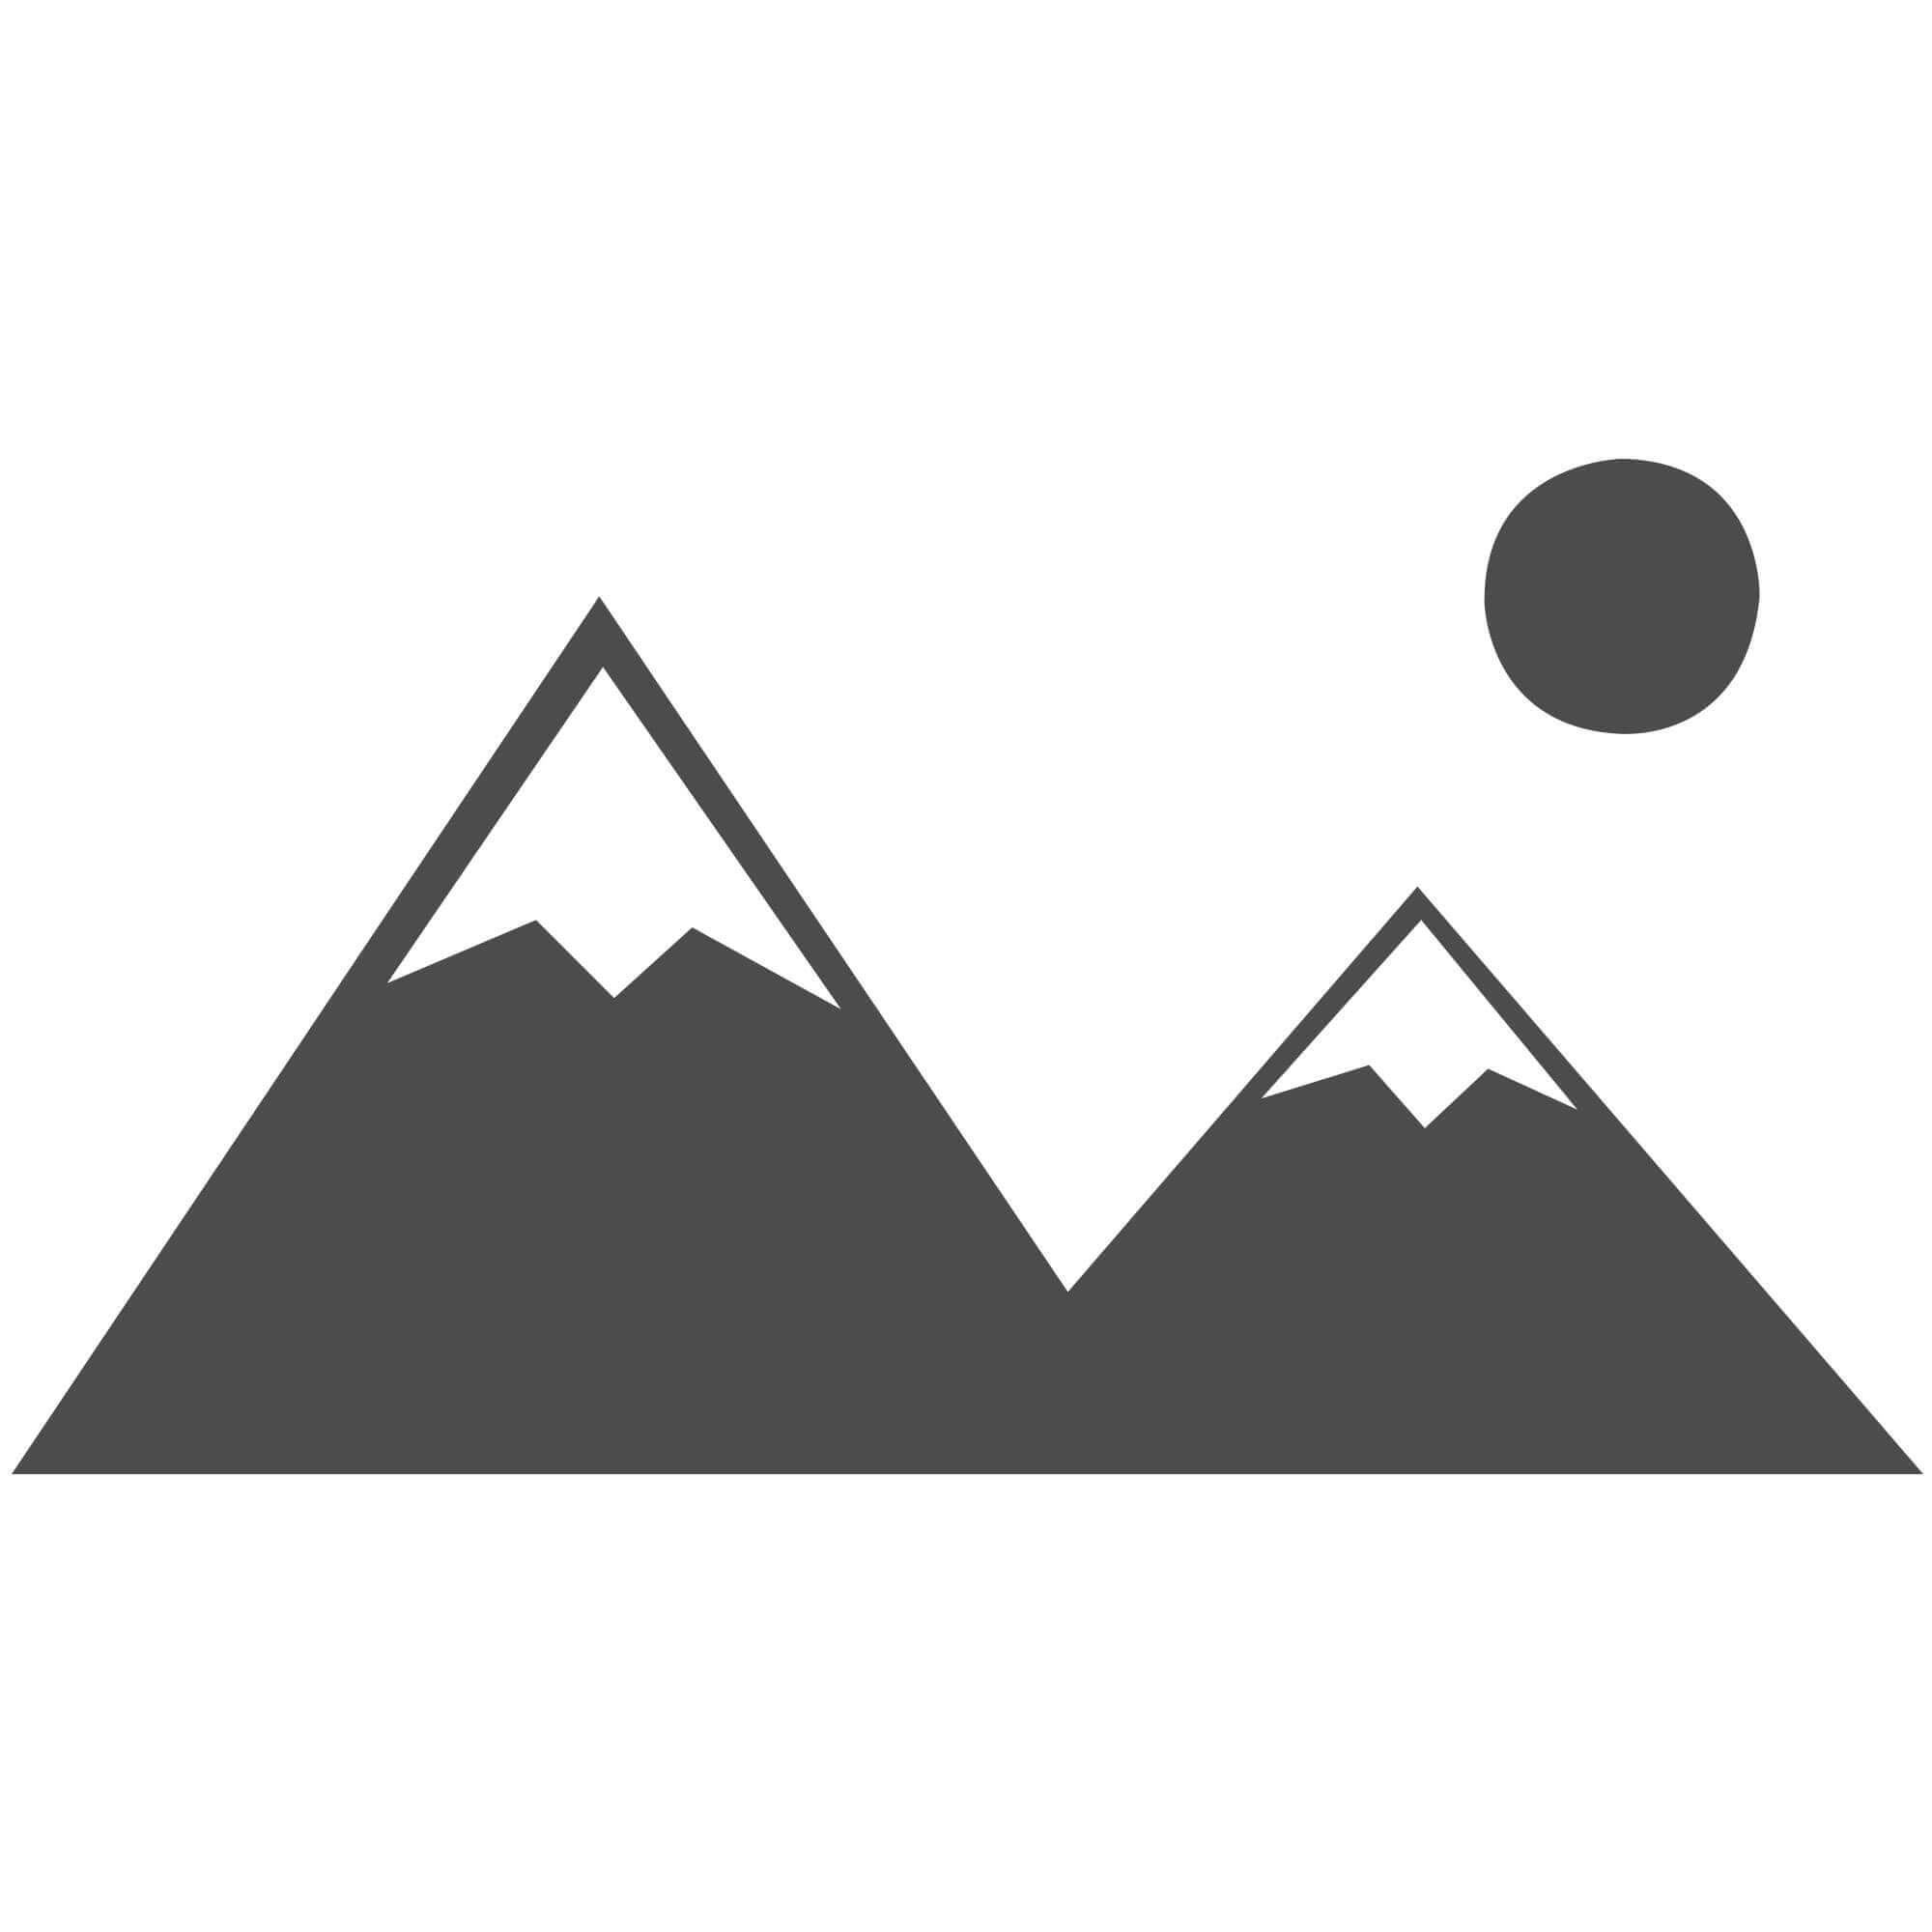 Galleria Rug - Stripe Multi 79164 4848 - Size Runner 67 x 330 cm